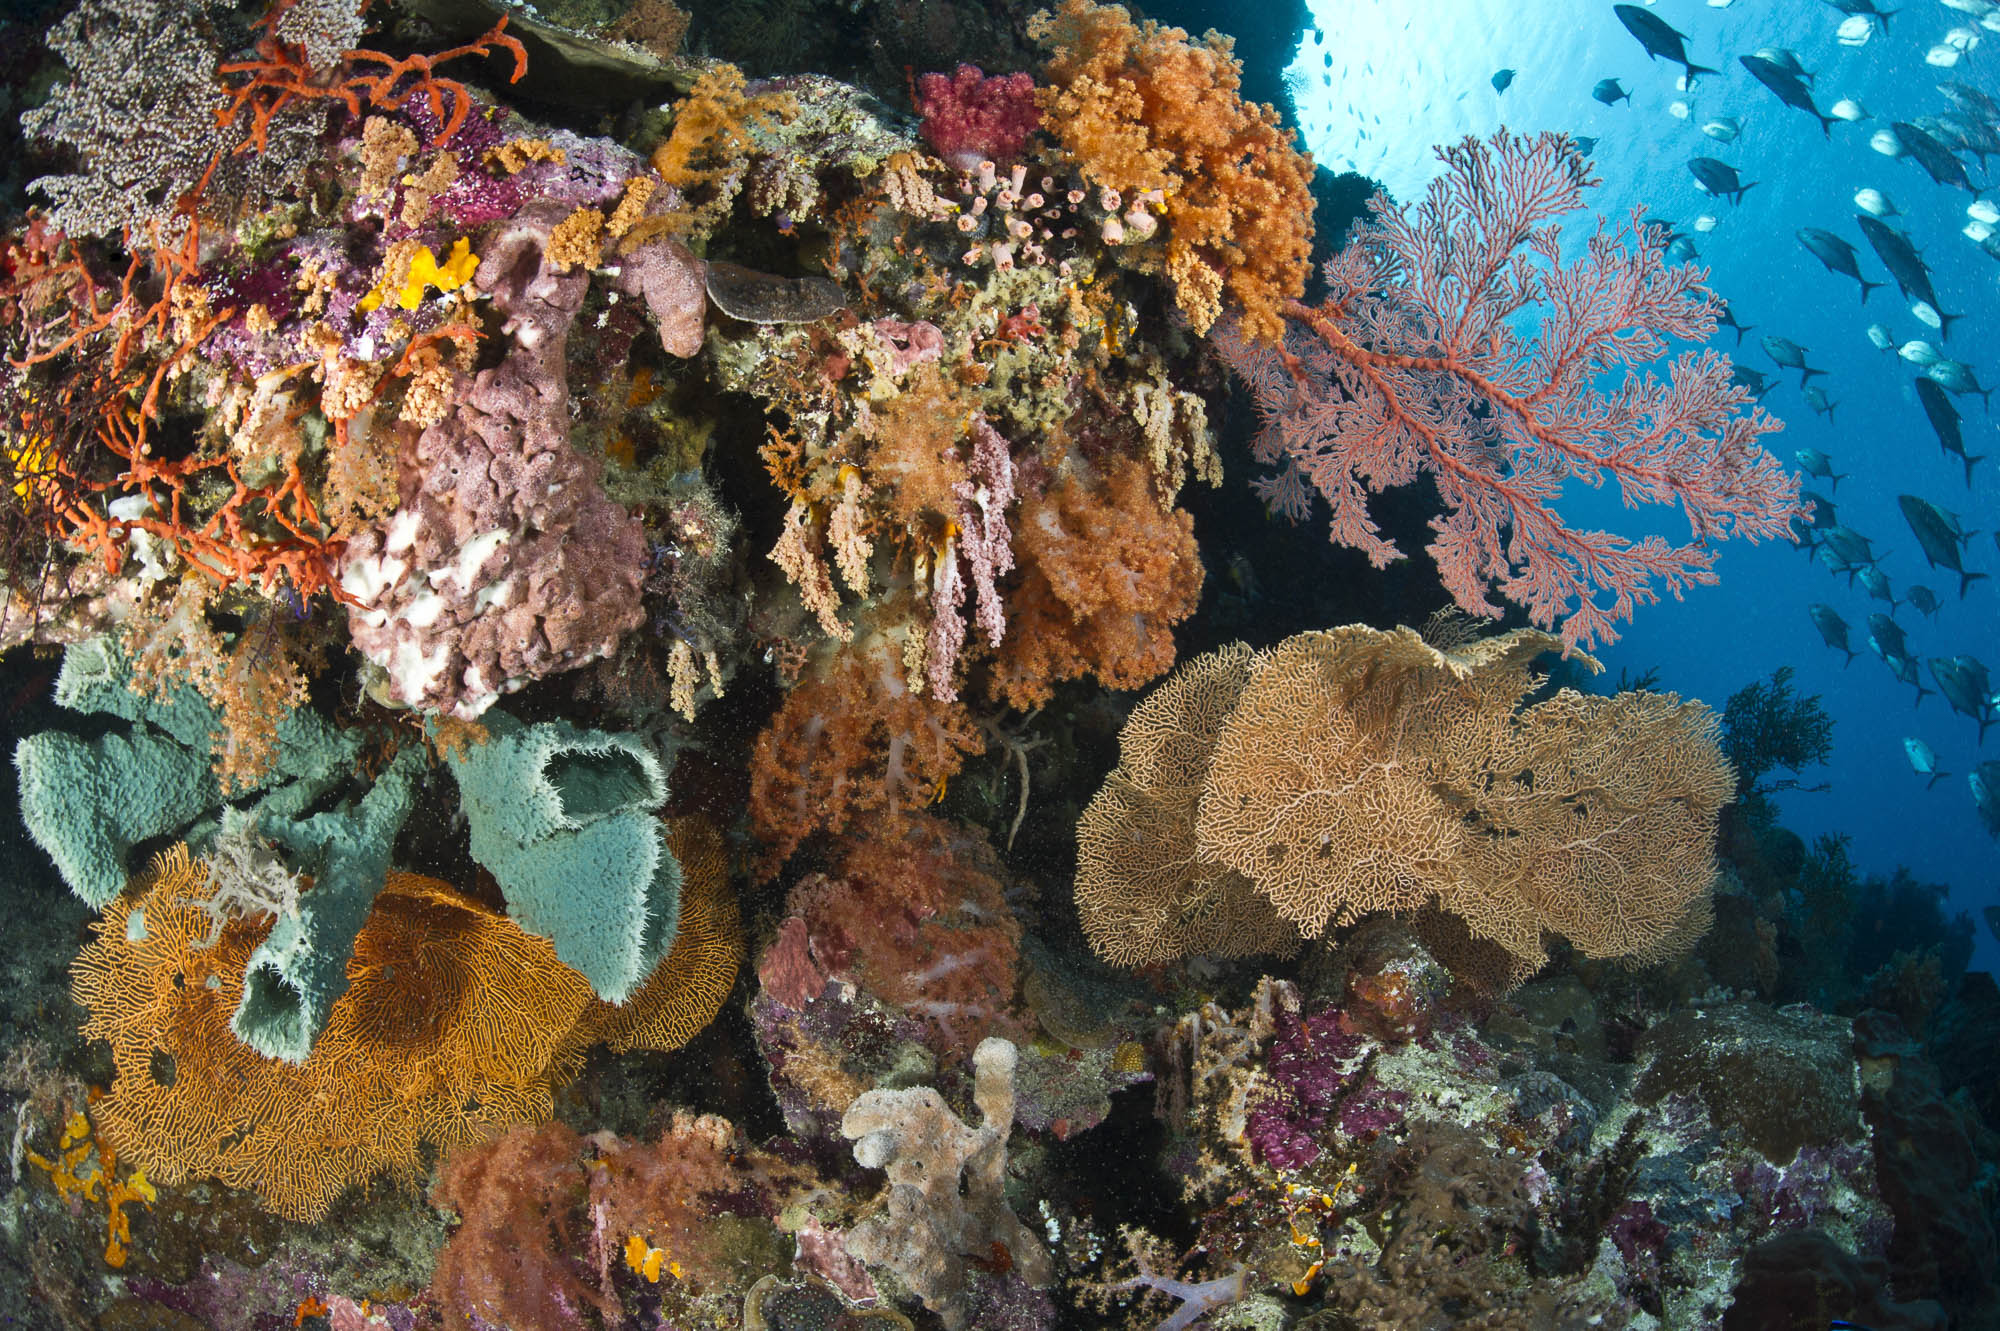 Wakatobi , Indonesia credit: Warren Baverstock / Coral reef image bank